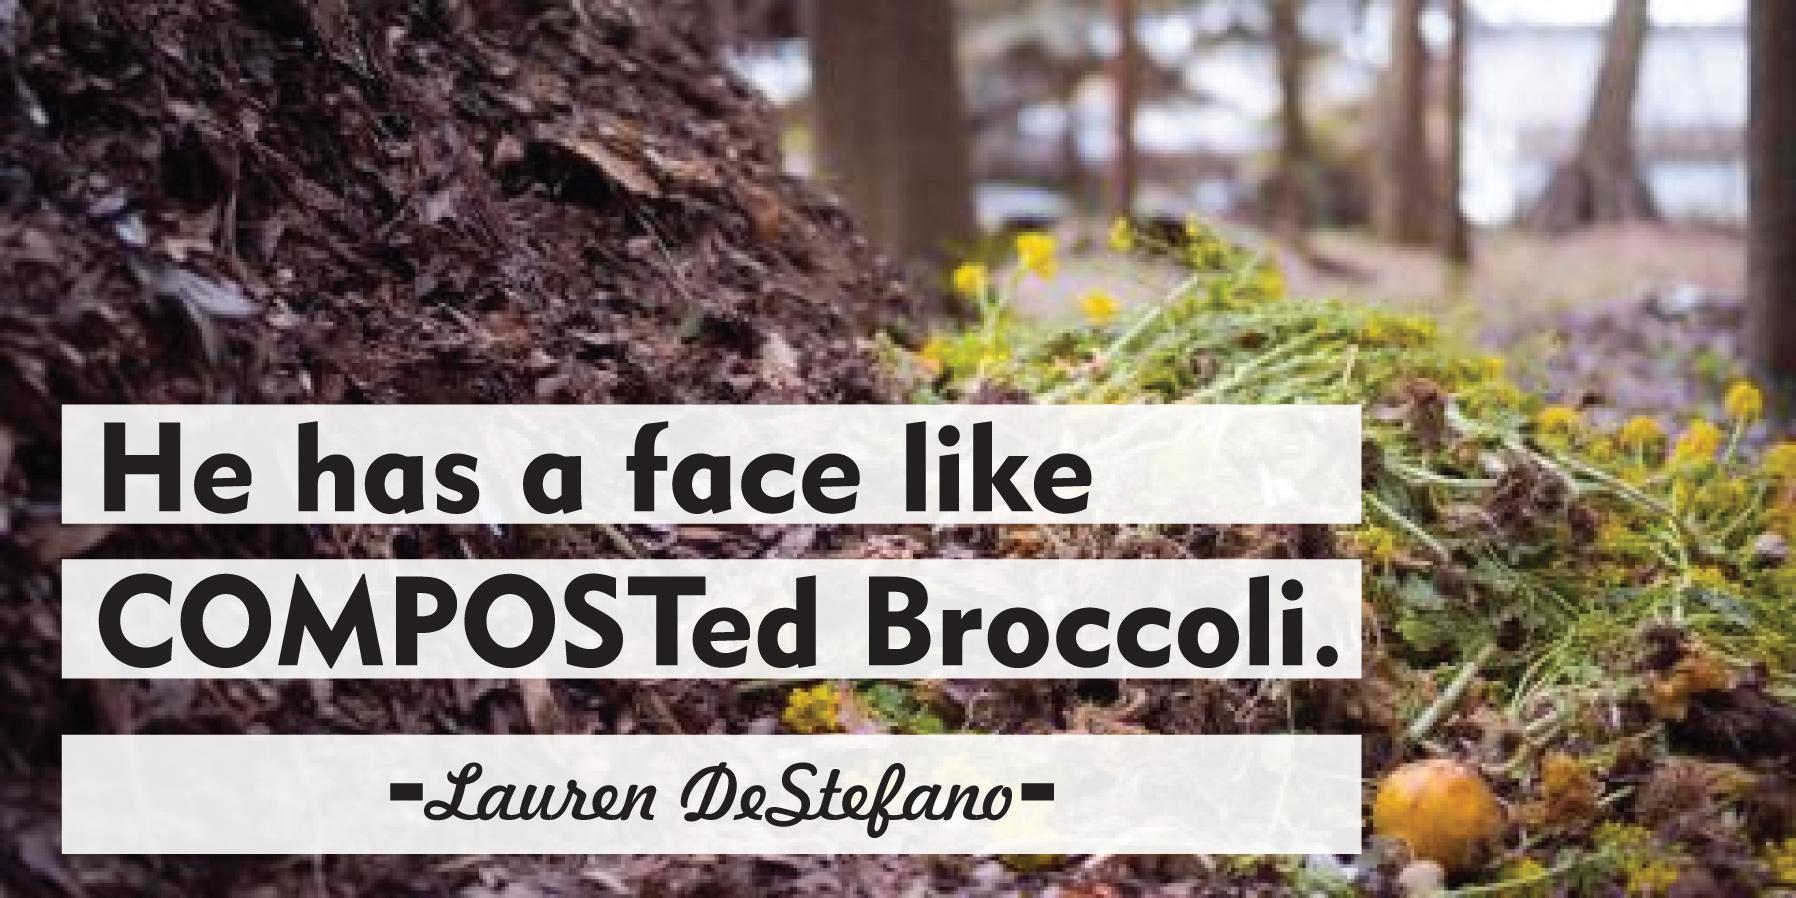 compost face like broccoli.jpg